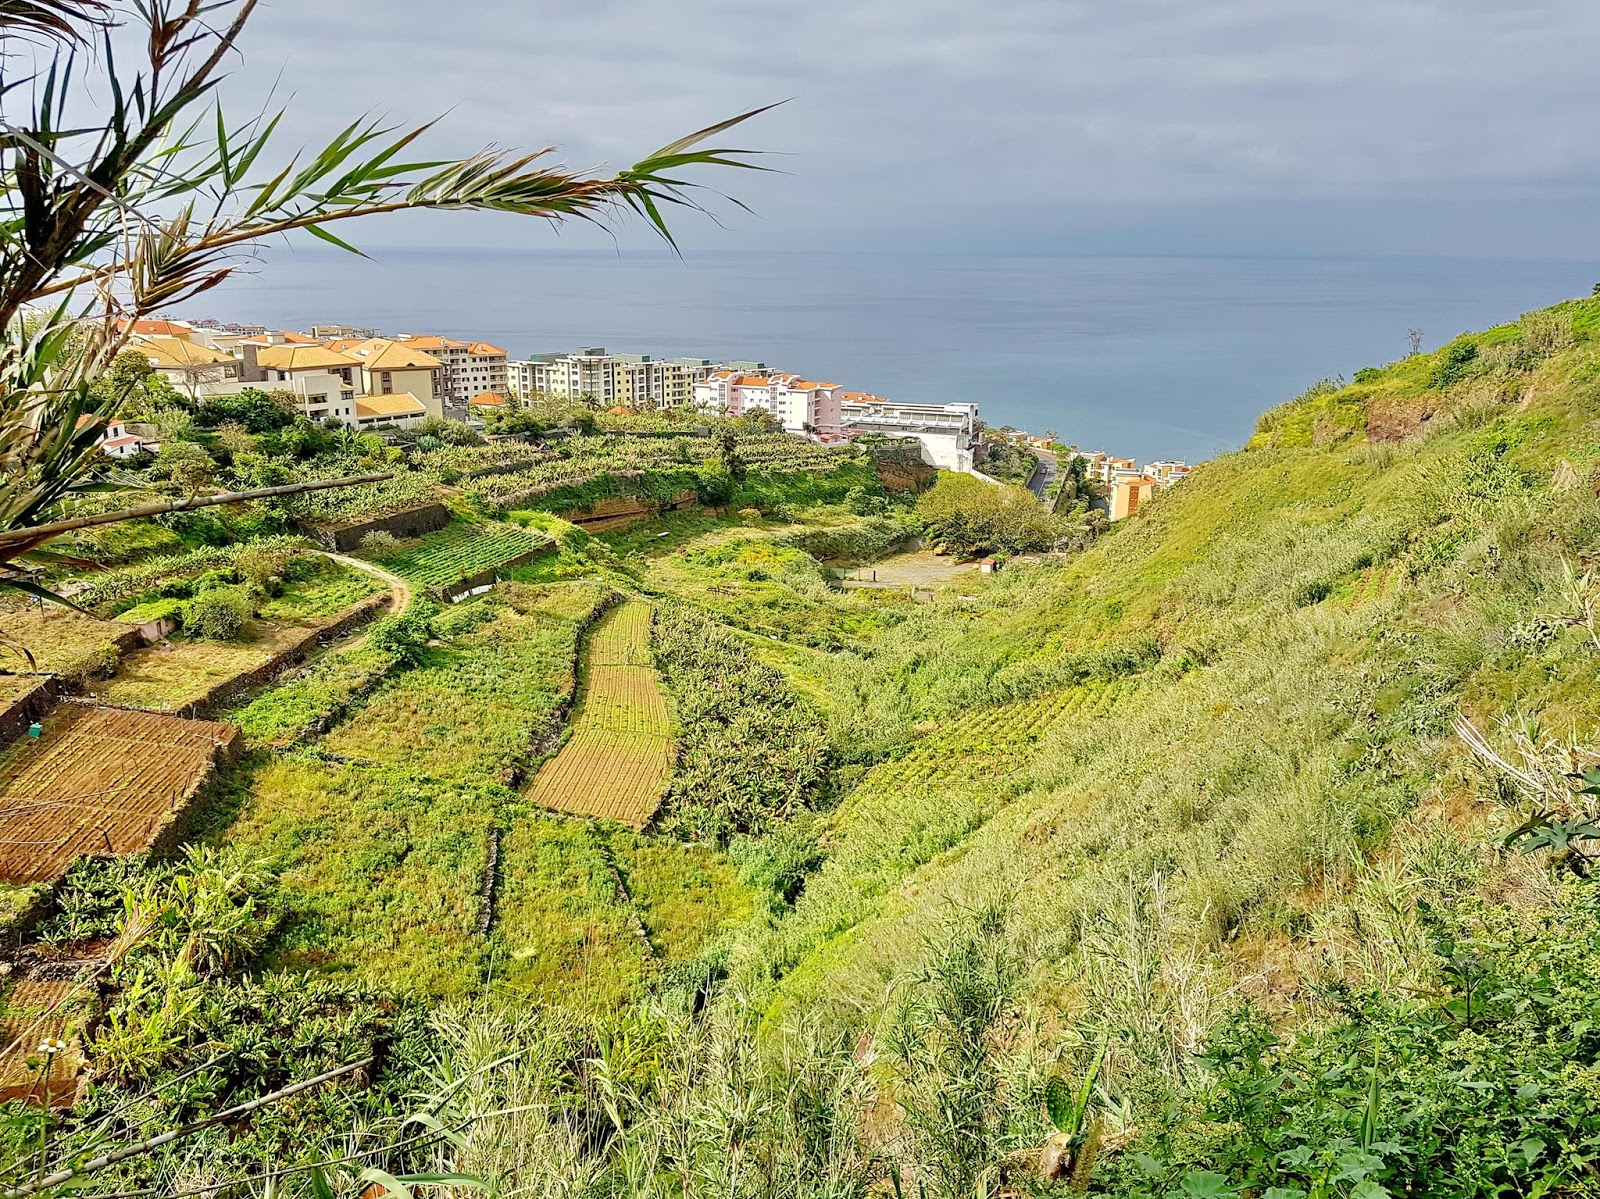 verde a norte da Praia Formosa